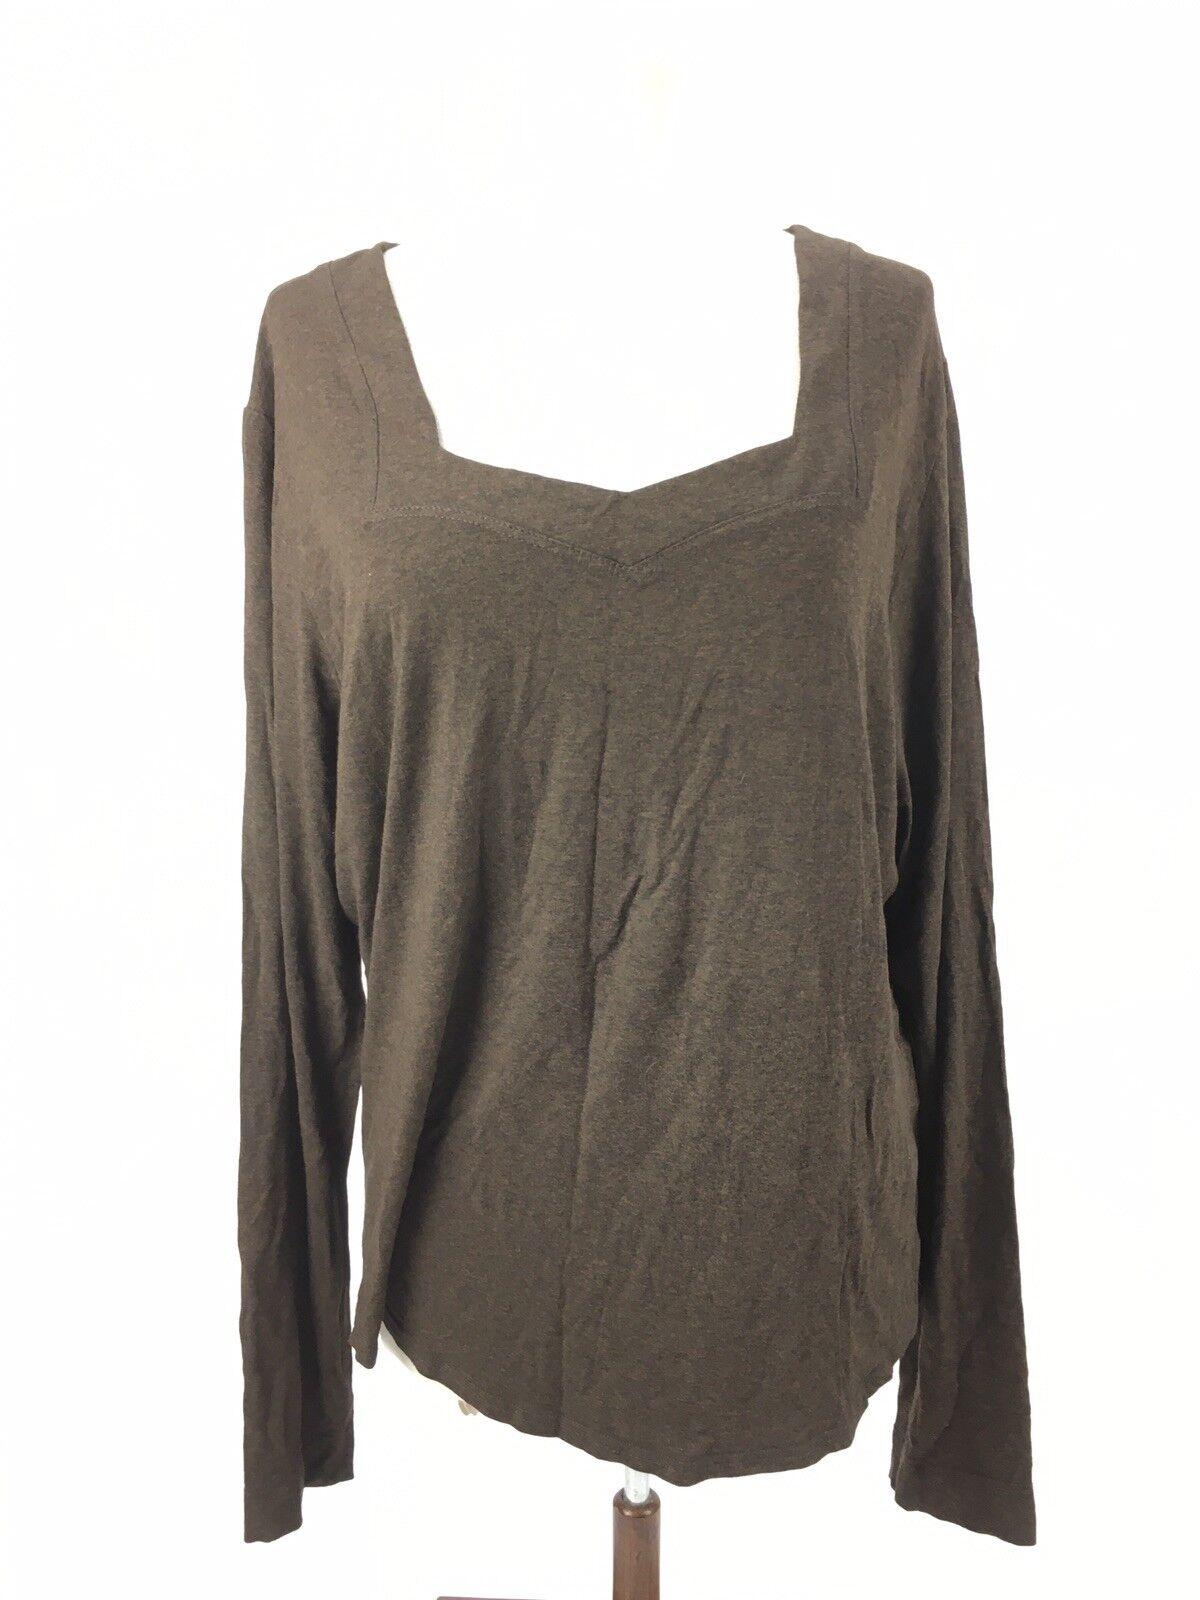 EVA & CLAUDI - Damen Damen Damen Pullover Gr. XXL in Braun | Sale Online Shop  6579a1